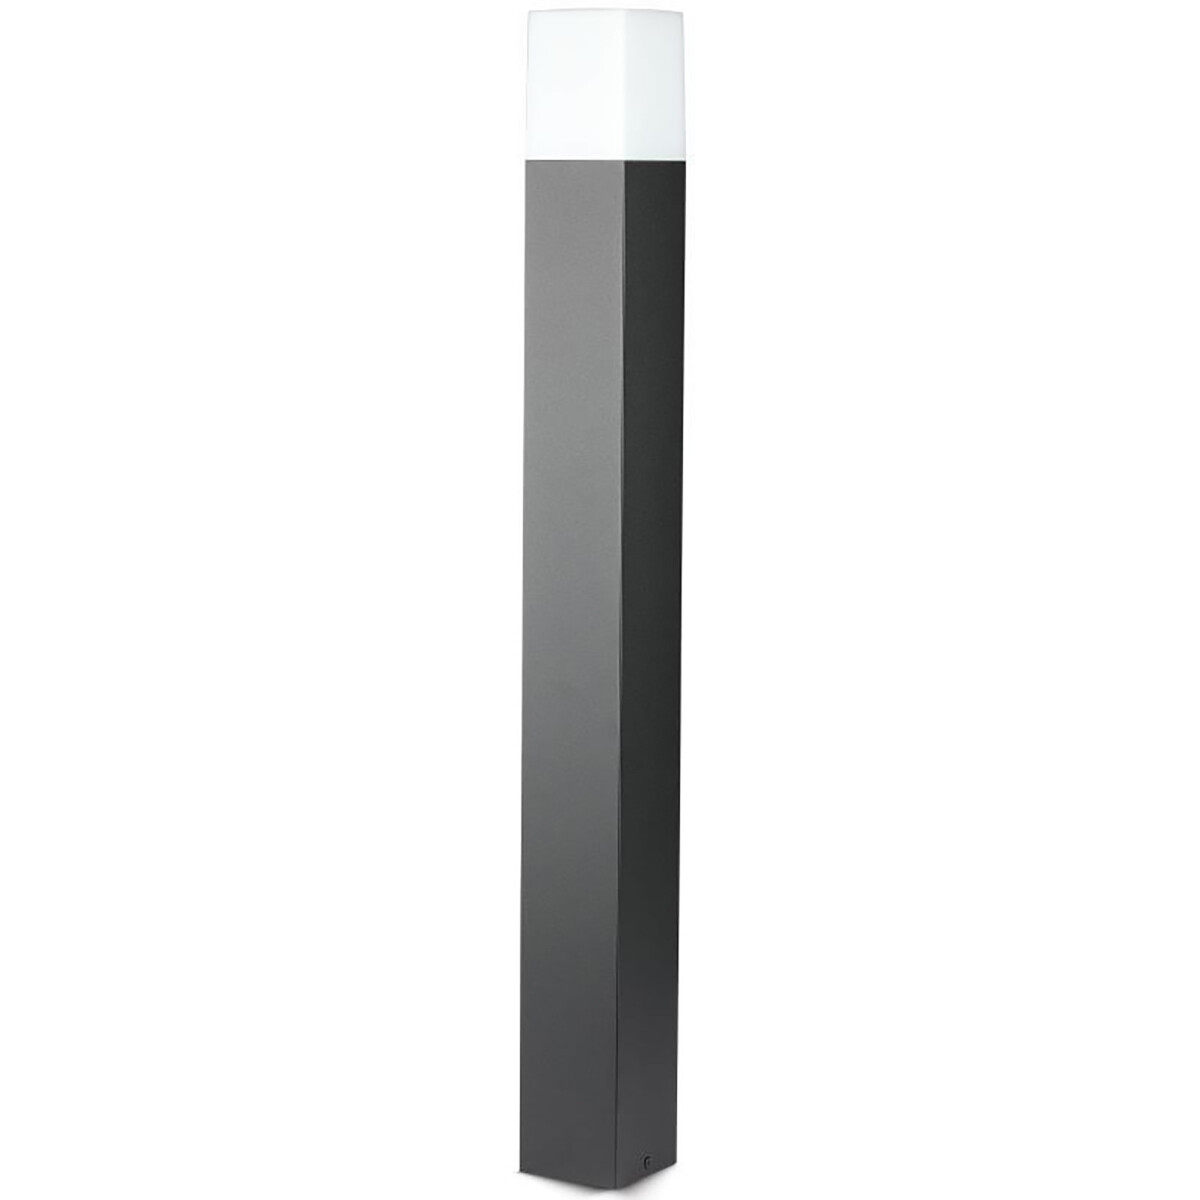 LED Tuinverlichting - Staande Buitenlamp - Viron Hyno - GU10 Fitting - Rechthoek - Mat Zwart - Alumi